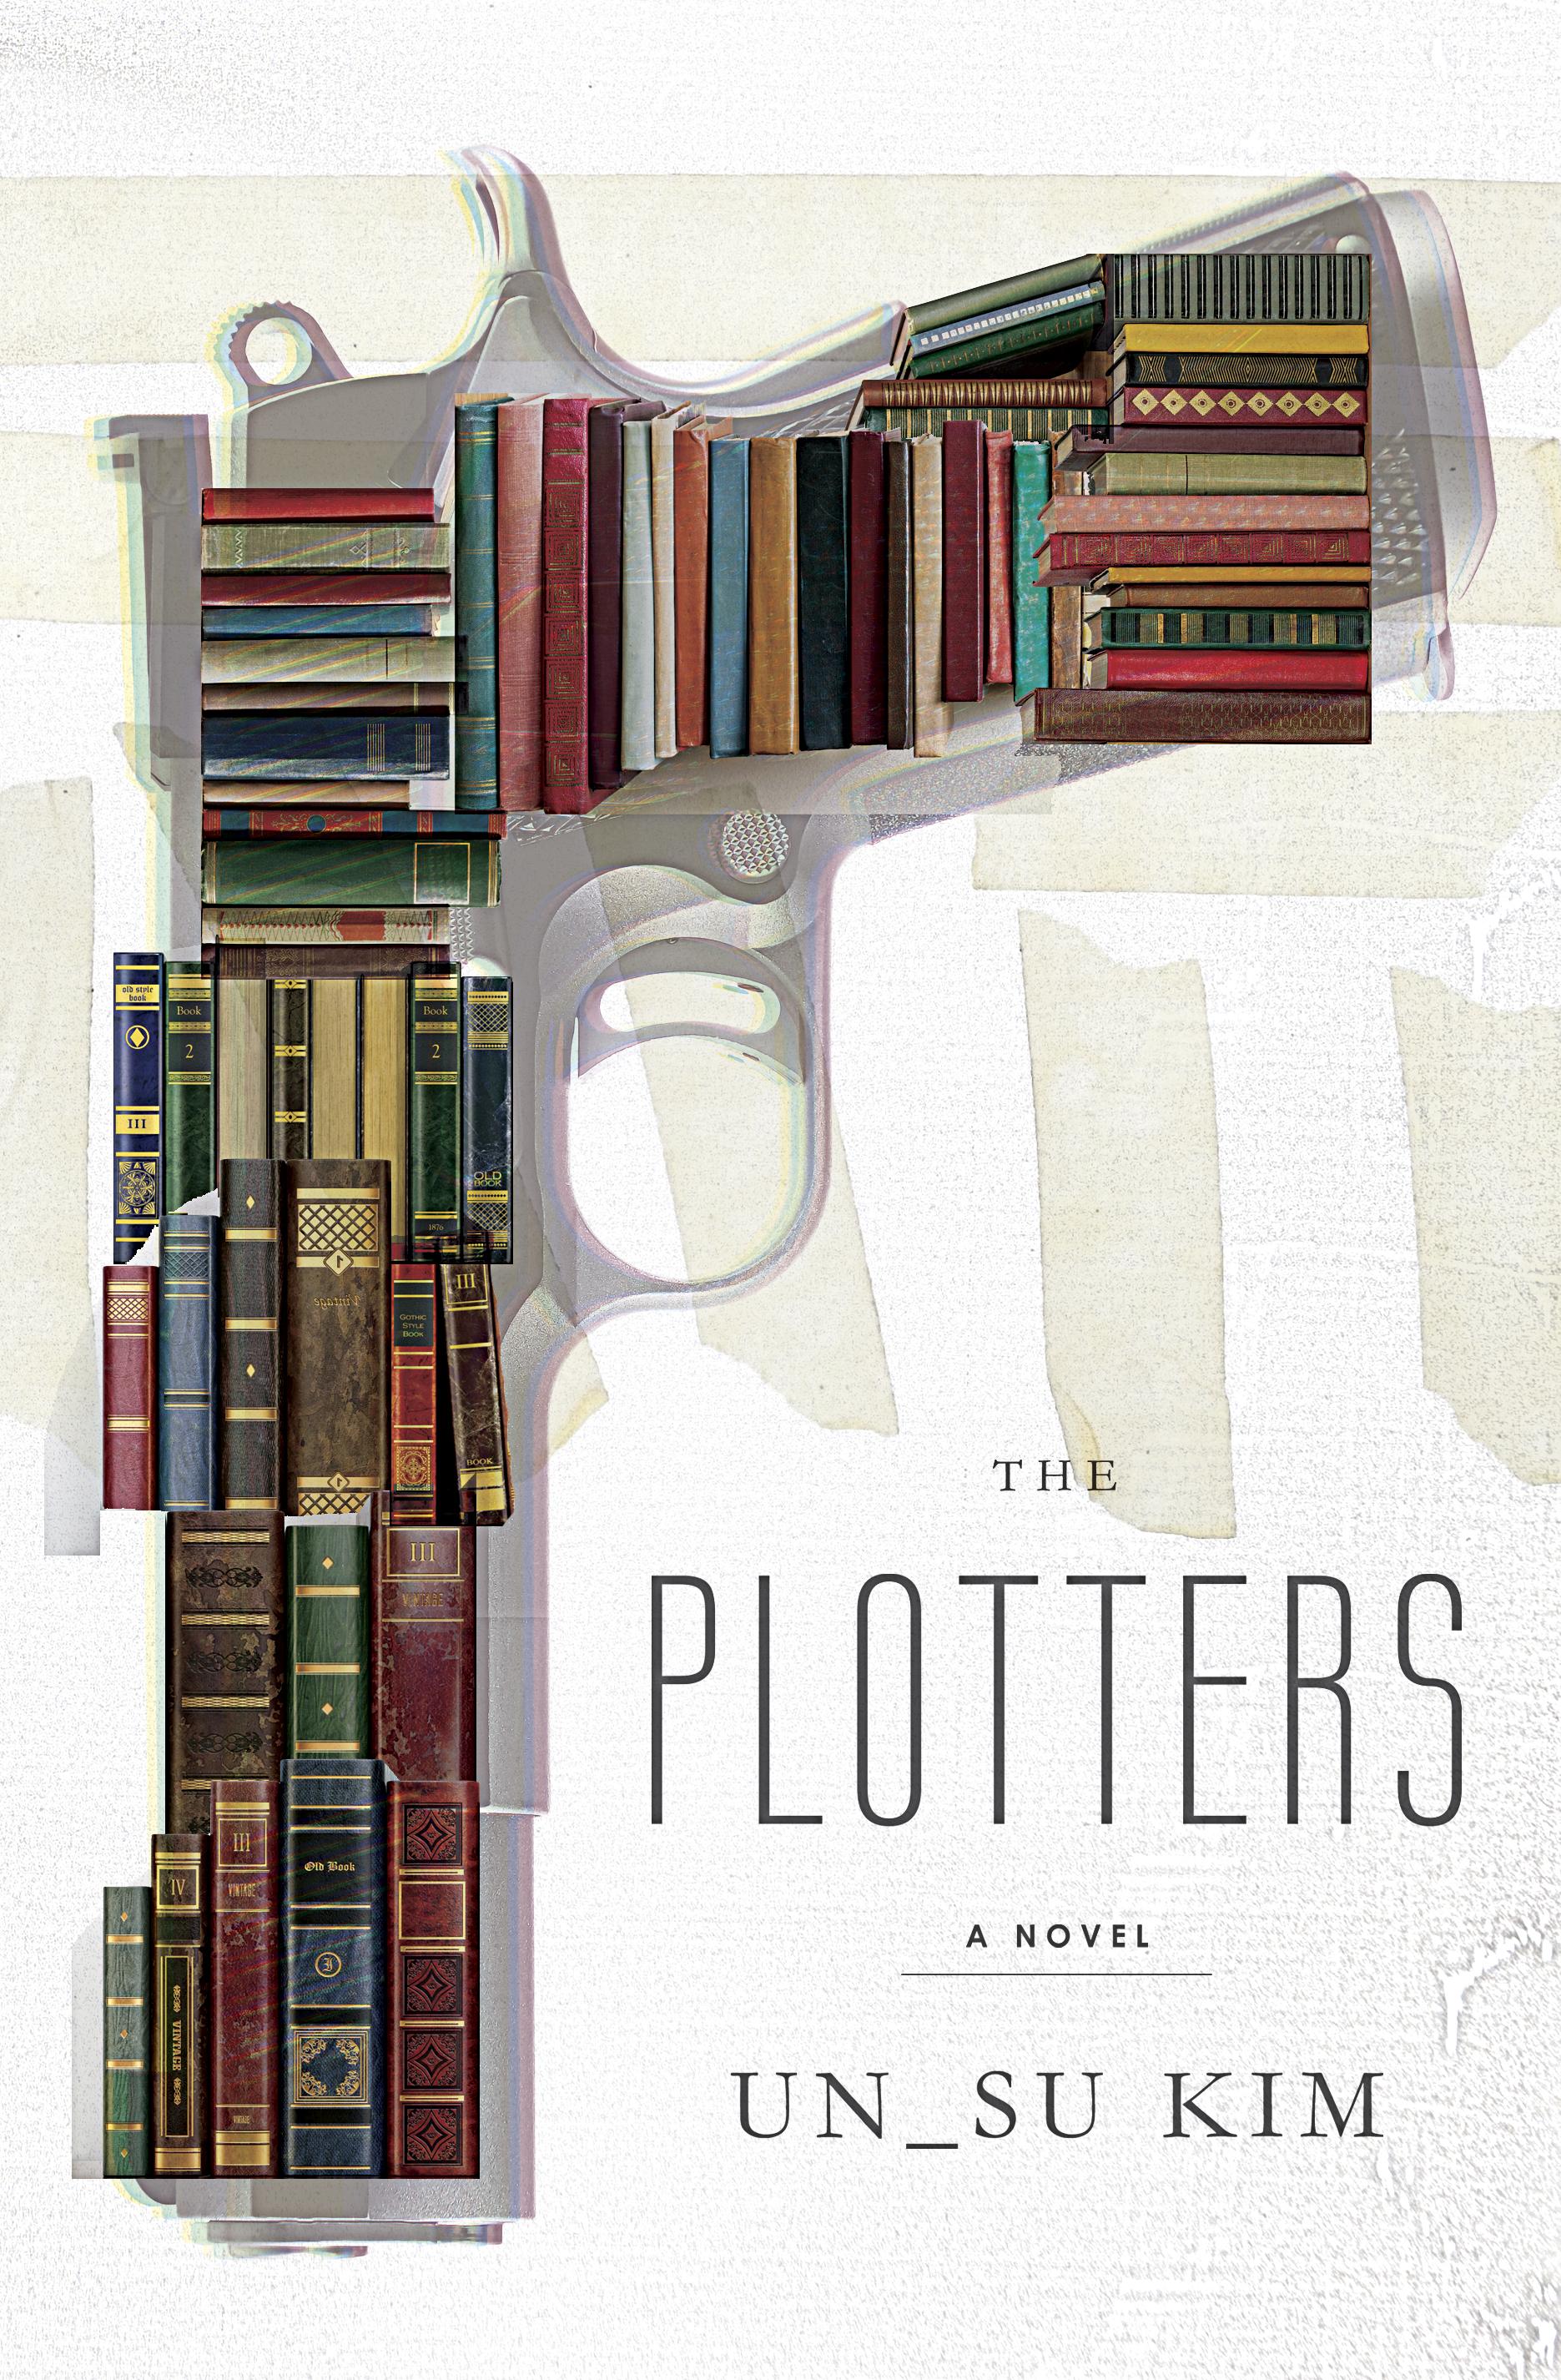 plotters art 3.jpg